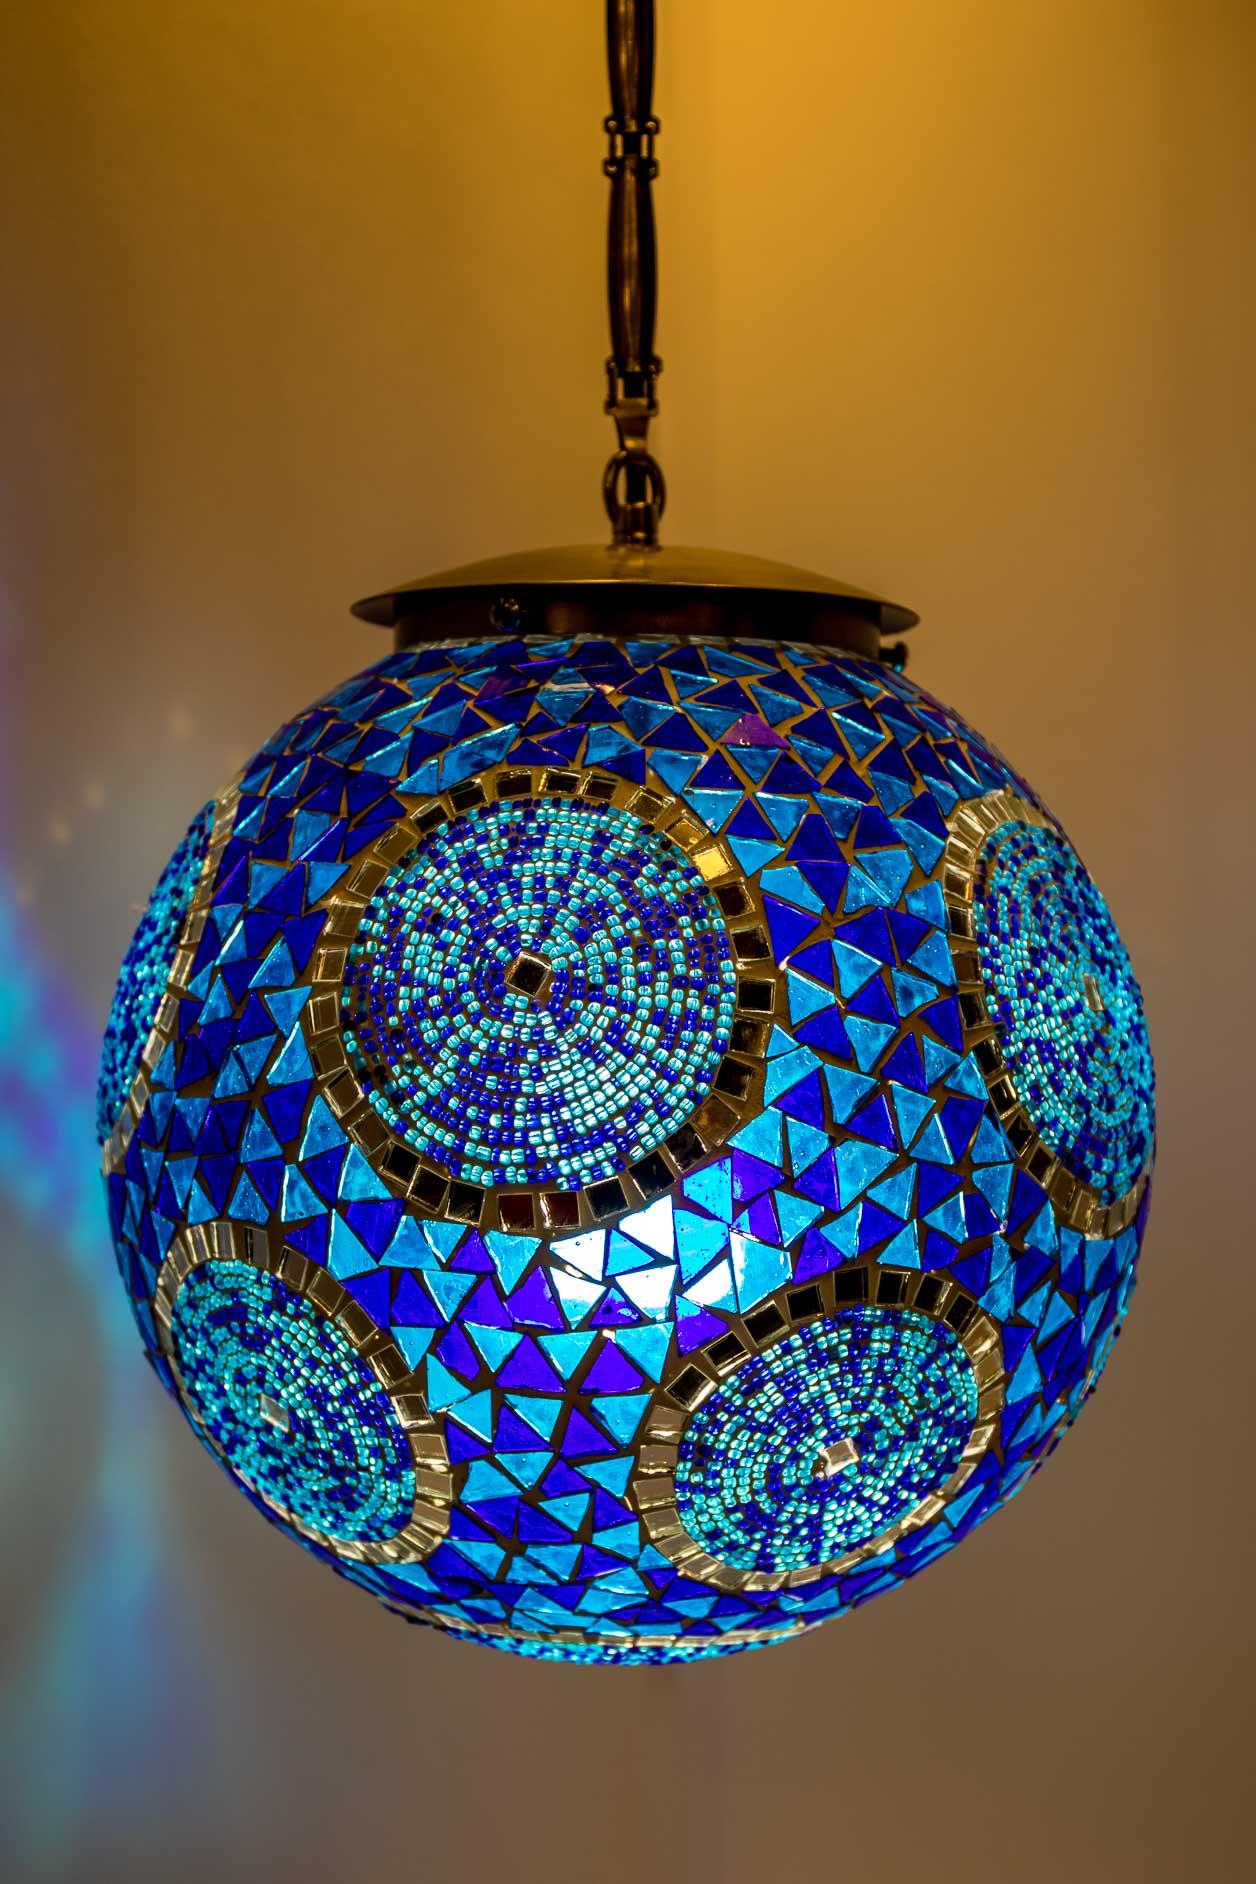 Petite lampe suspendue boule de mosaïque